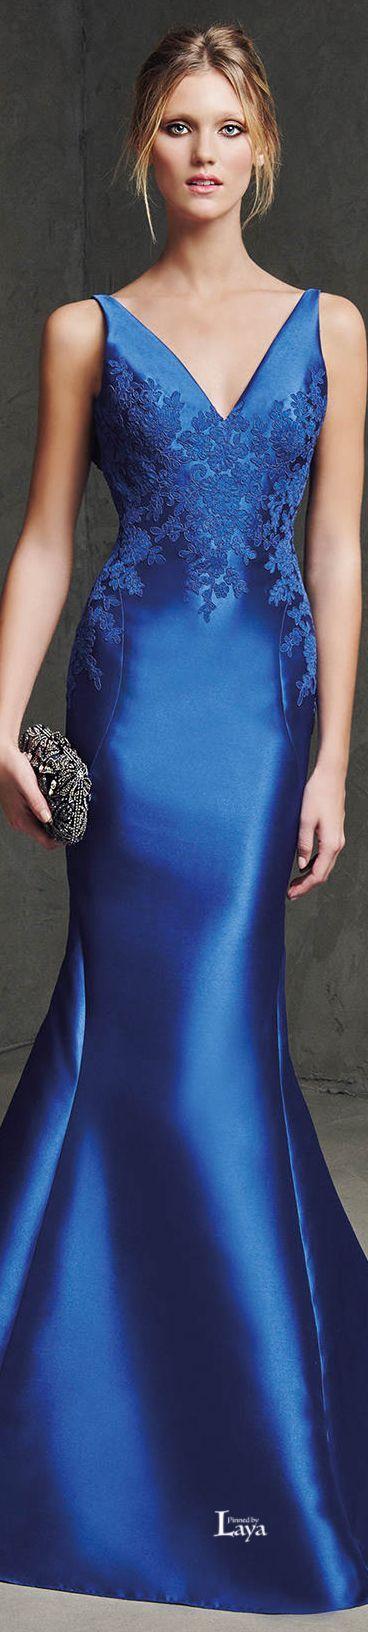 2016 EVENING Dresses